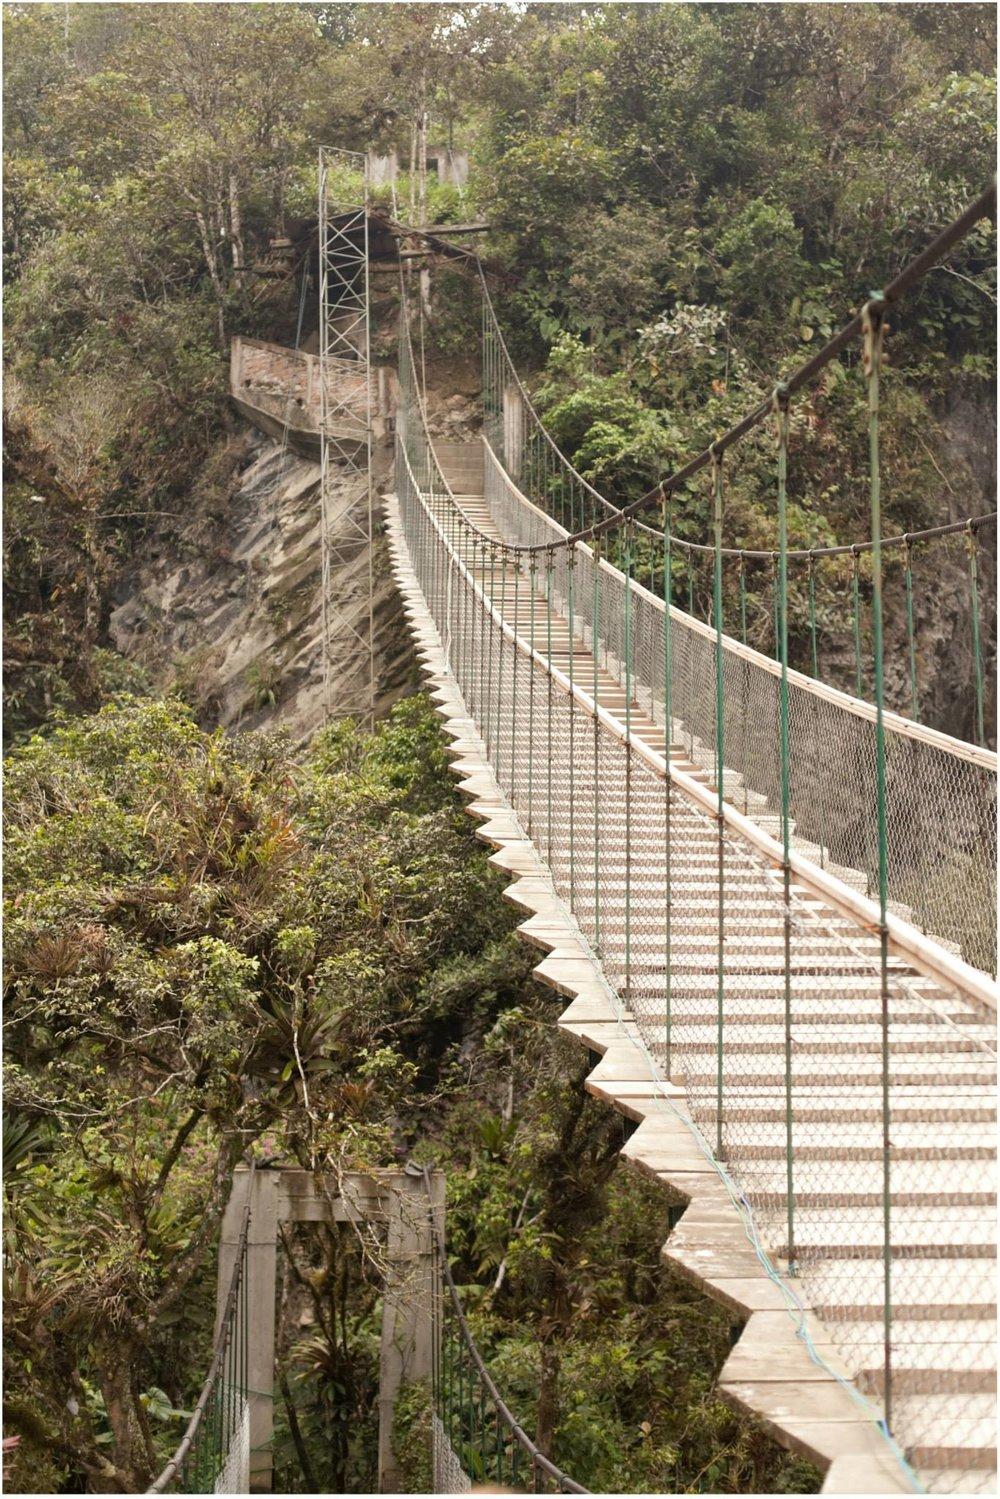 banos-ecuador-bridge-hiking.jpg